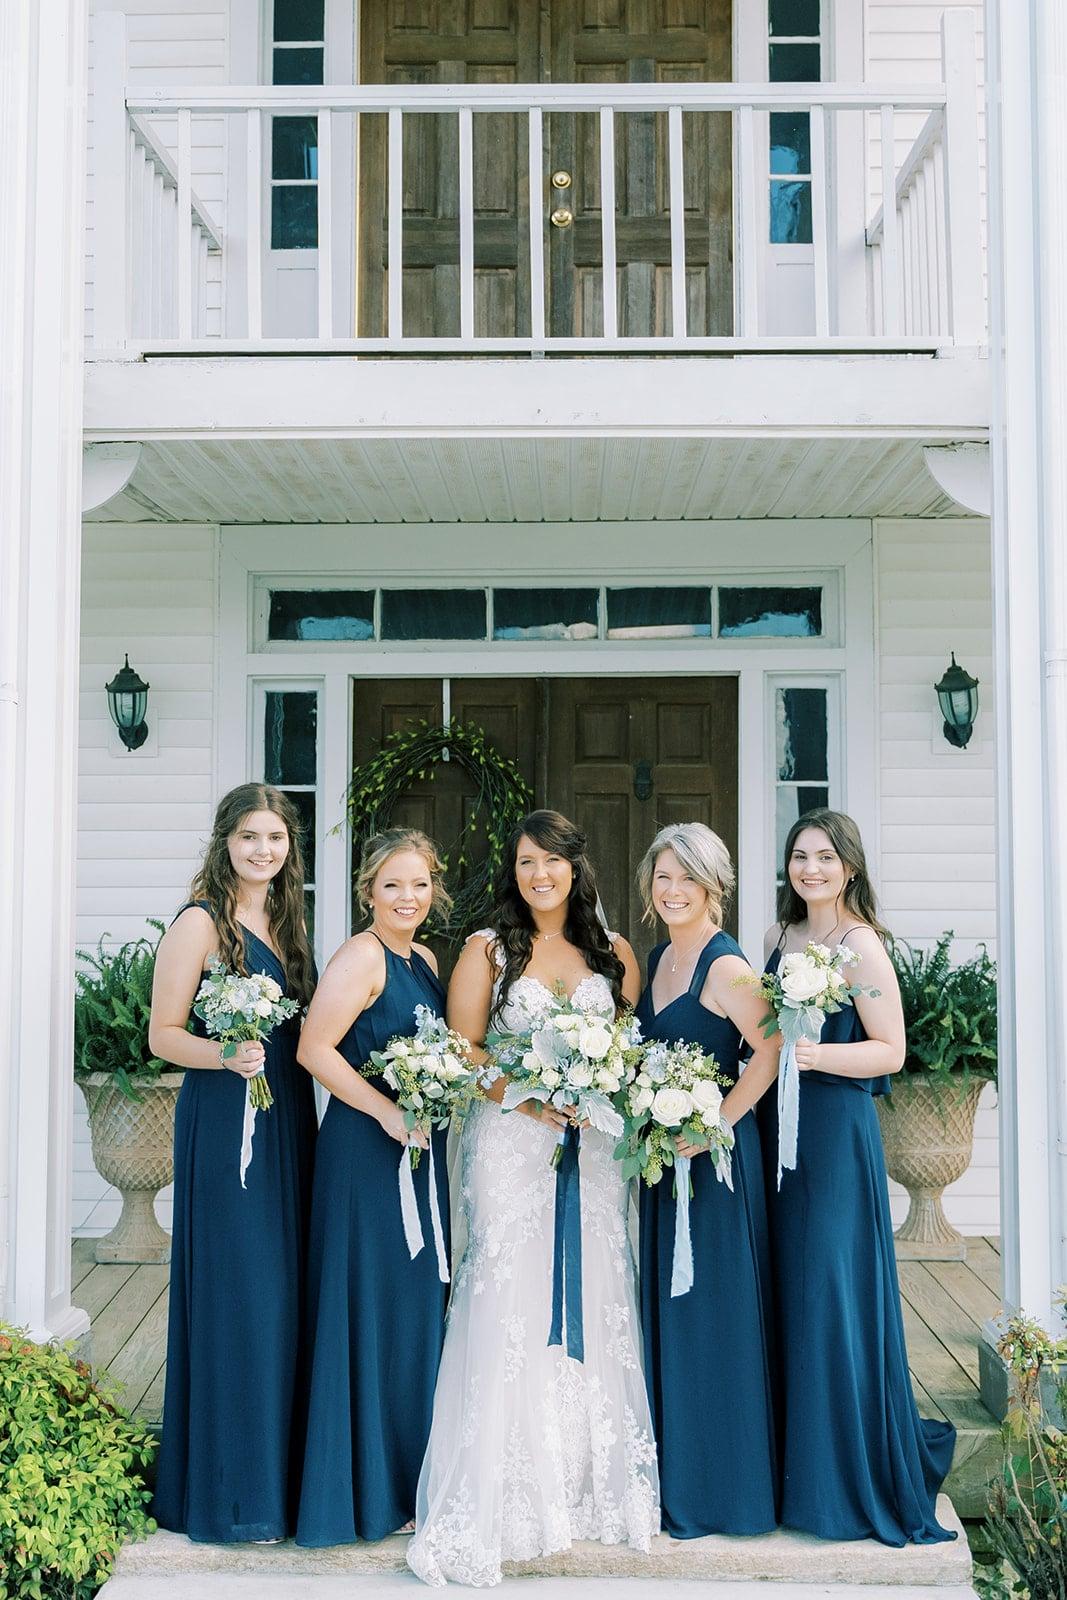 Navy blue bridesmaid dresses | Nashville Bride Guide